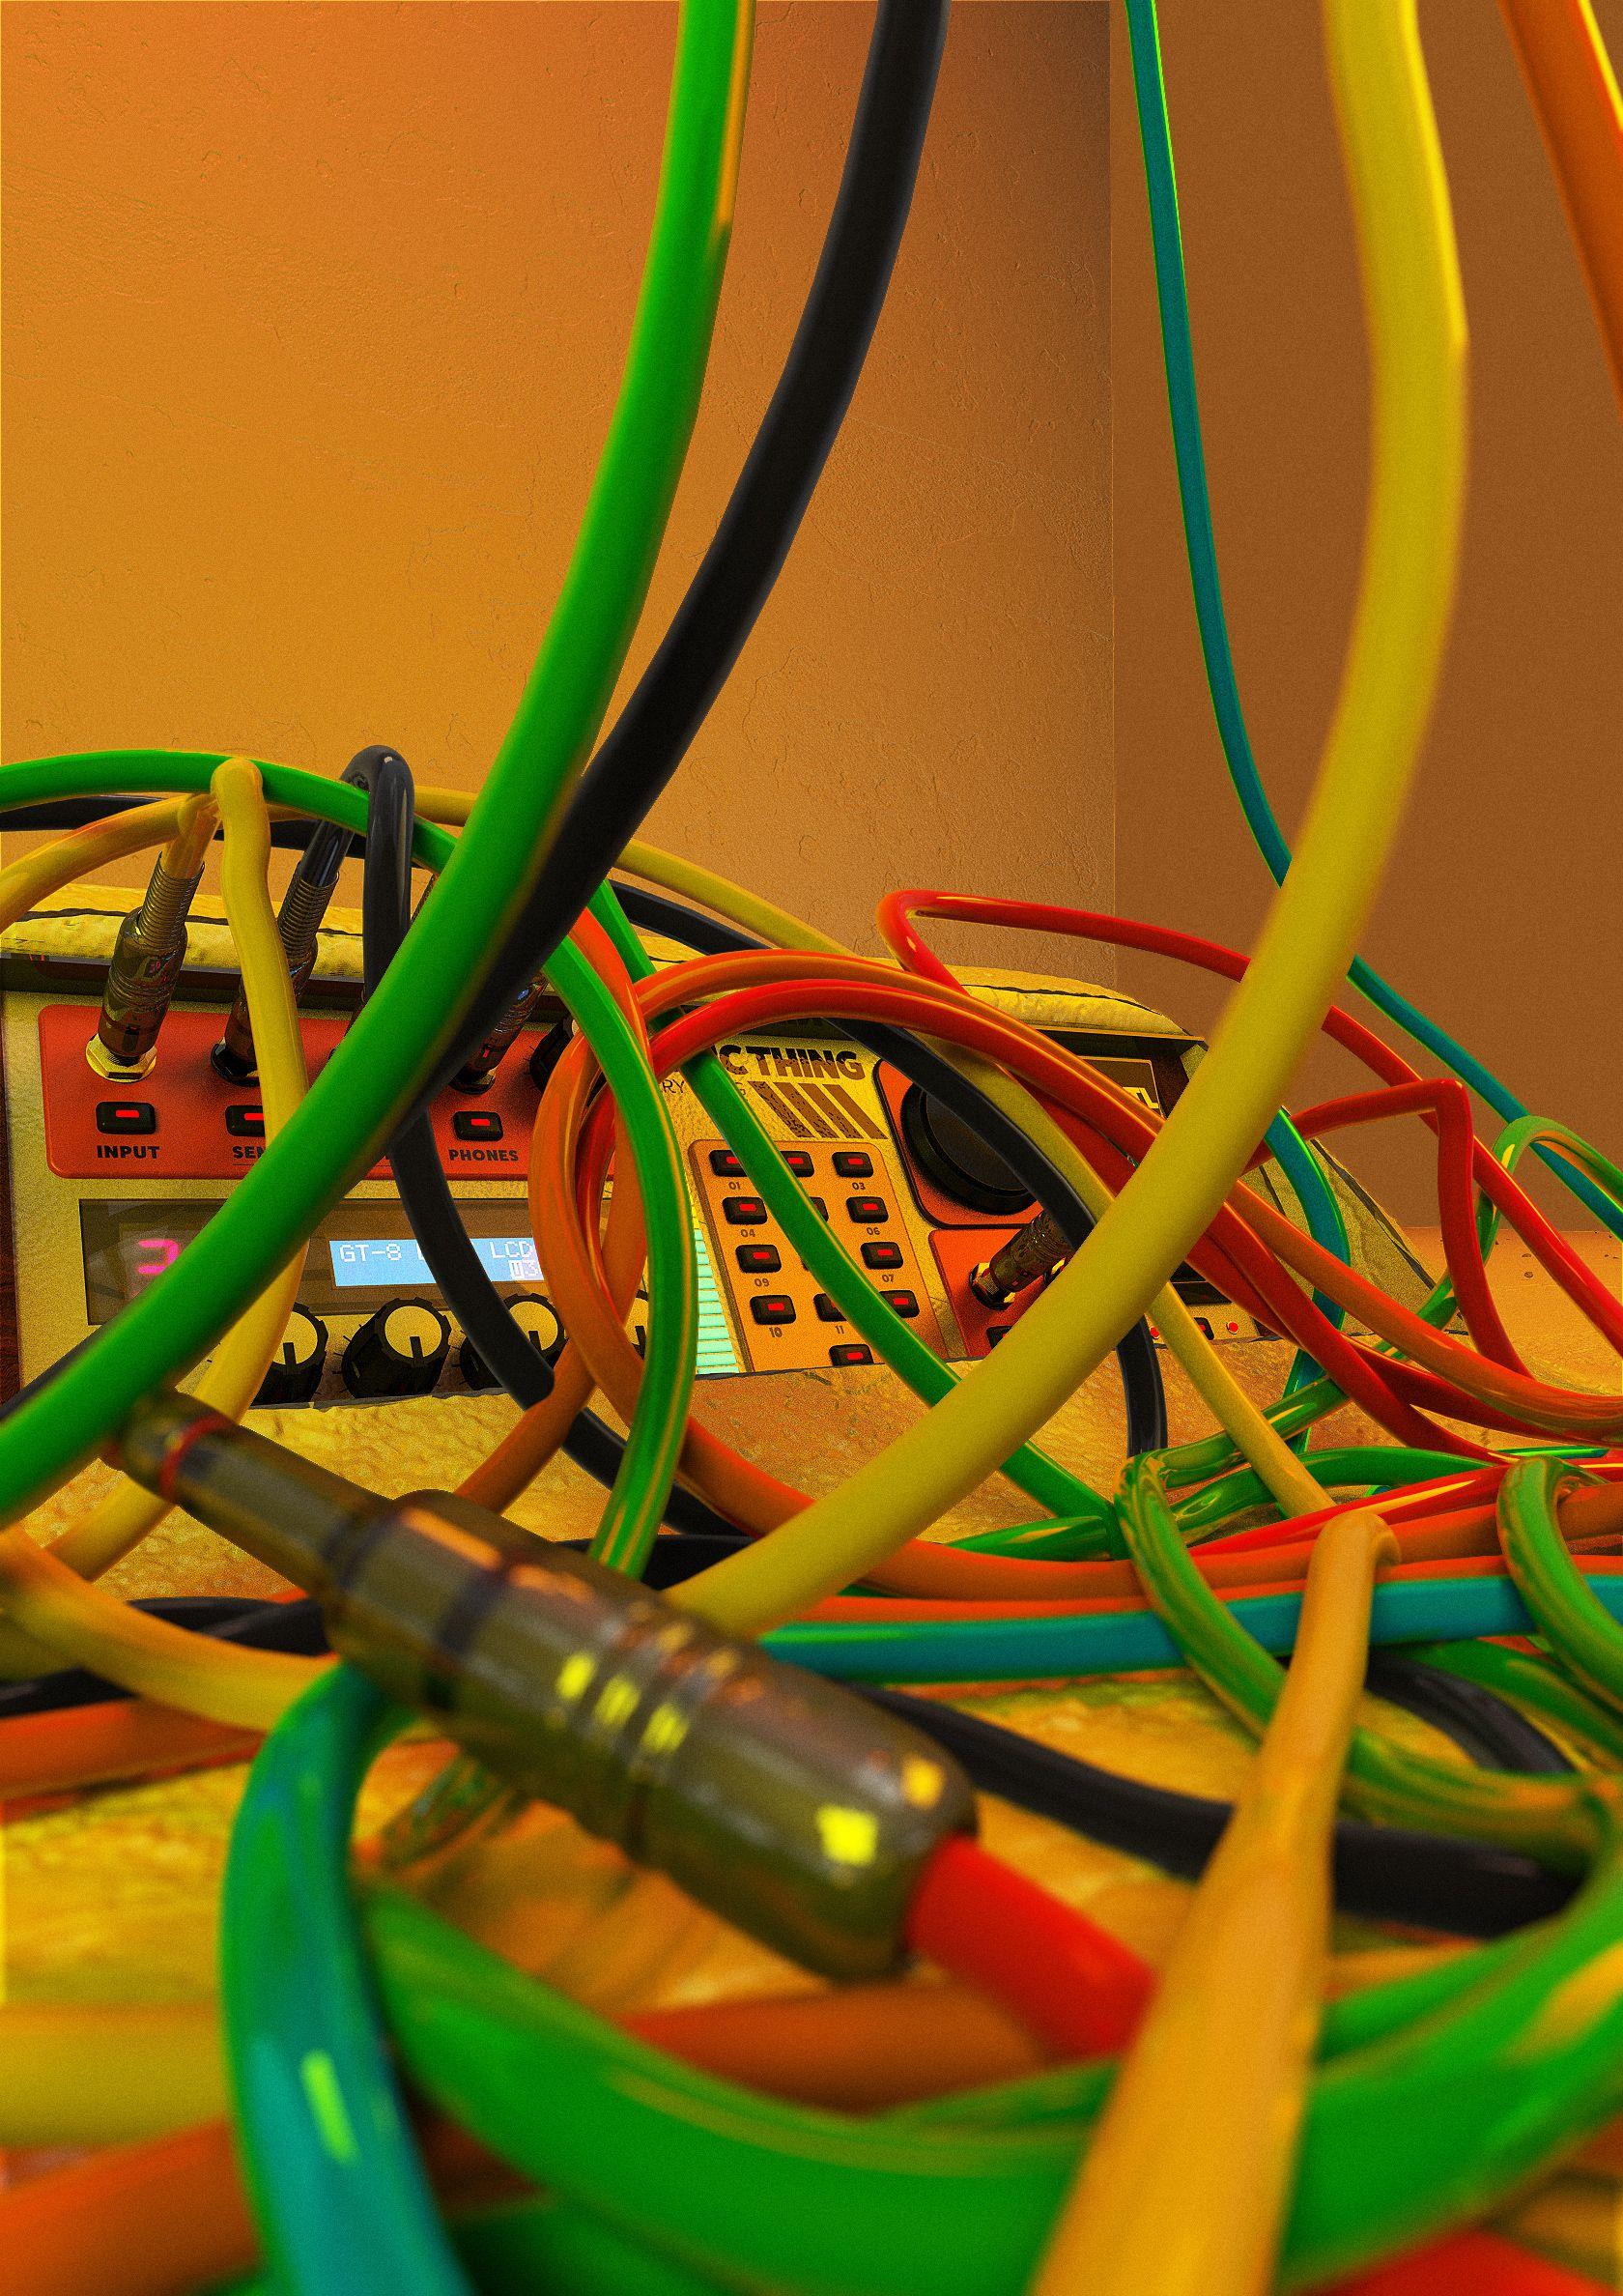 medium resolution of crazy wires experiments in spline dynamics